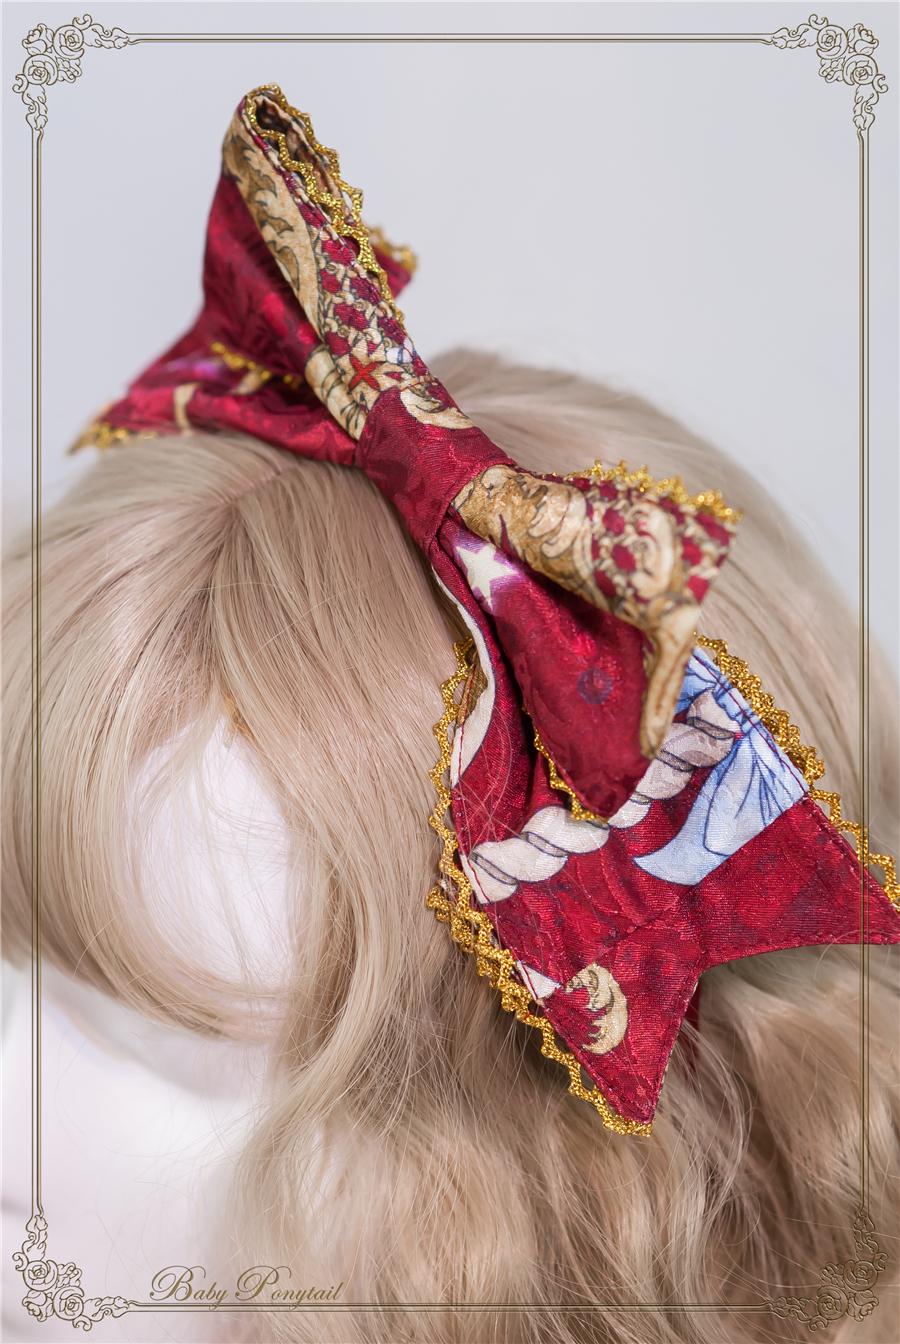 Baby Ponytail_Stock photo_Circus Princess_KC Red_04.jpg